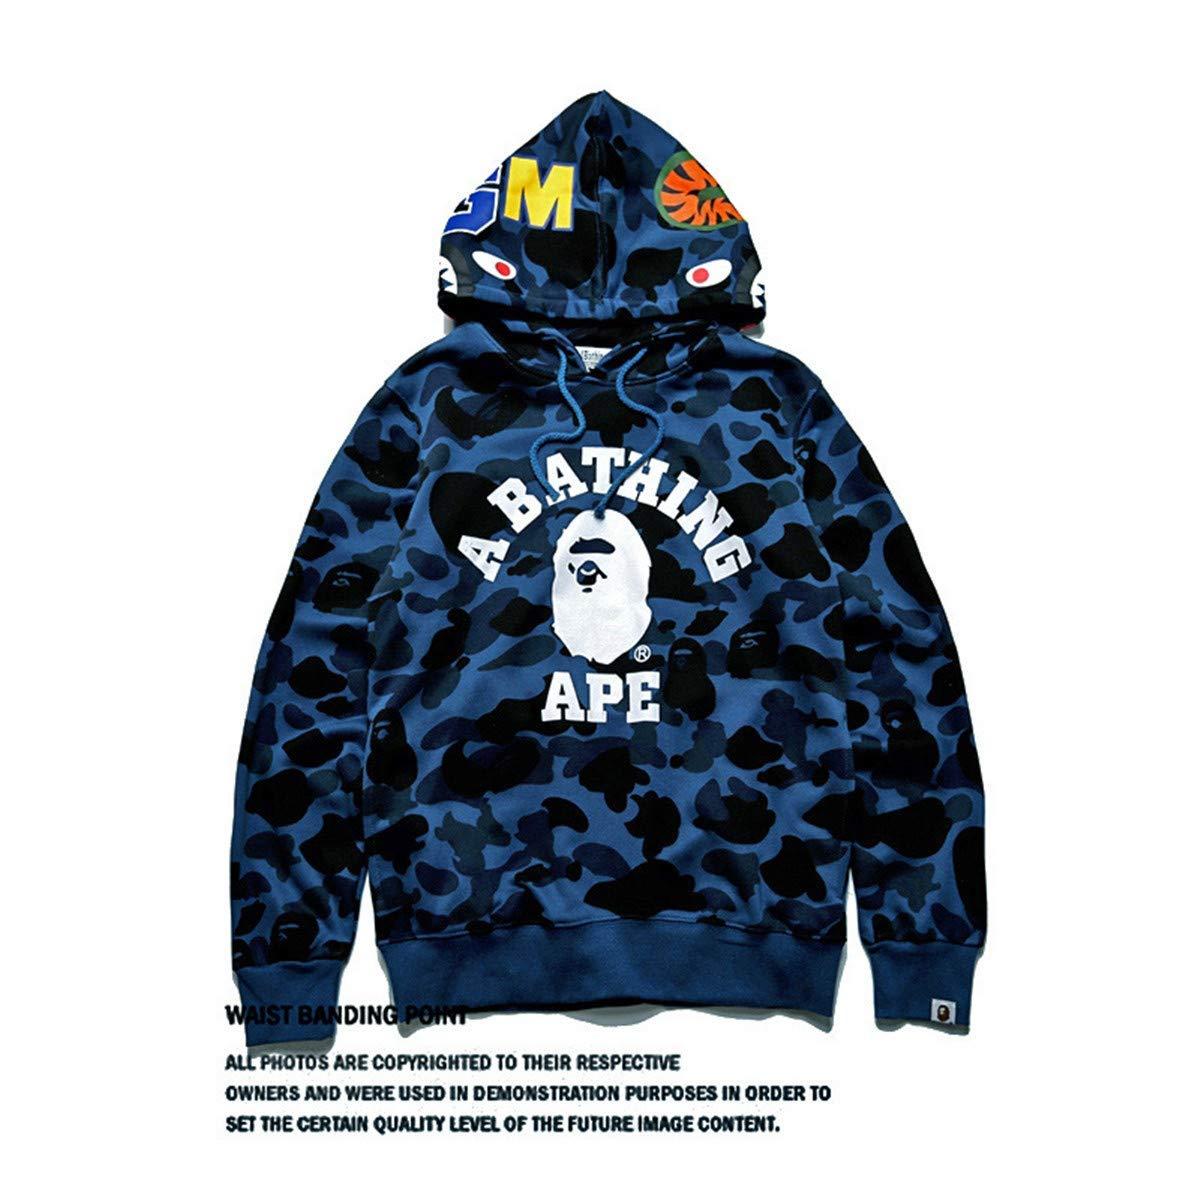 49b3f5c2 Men's Bape A Bathing Ape Full Zip Shark Head Camo Hoodie Coat Sweatshirt  Jacket Funny Tops